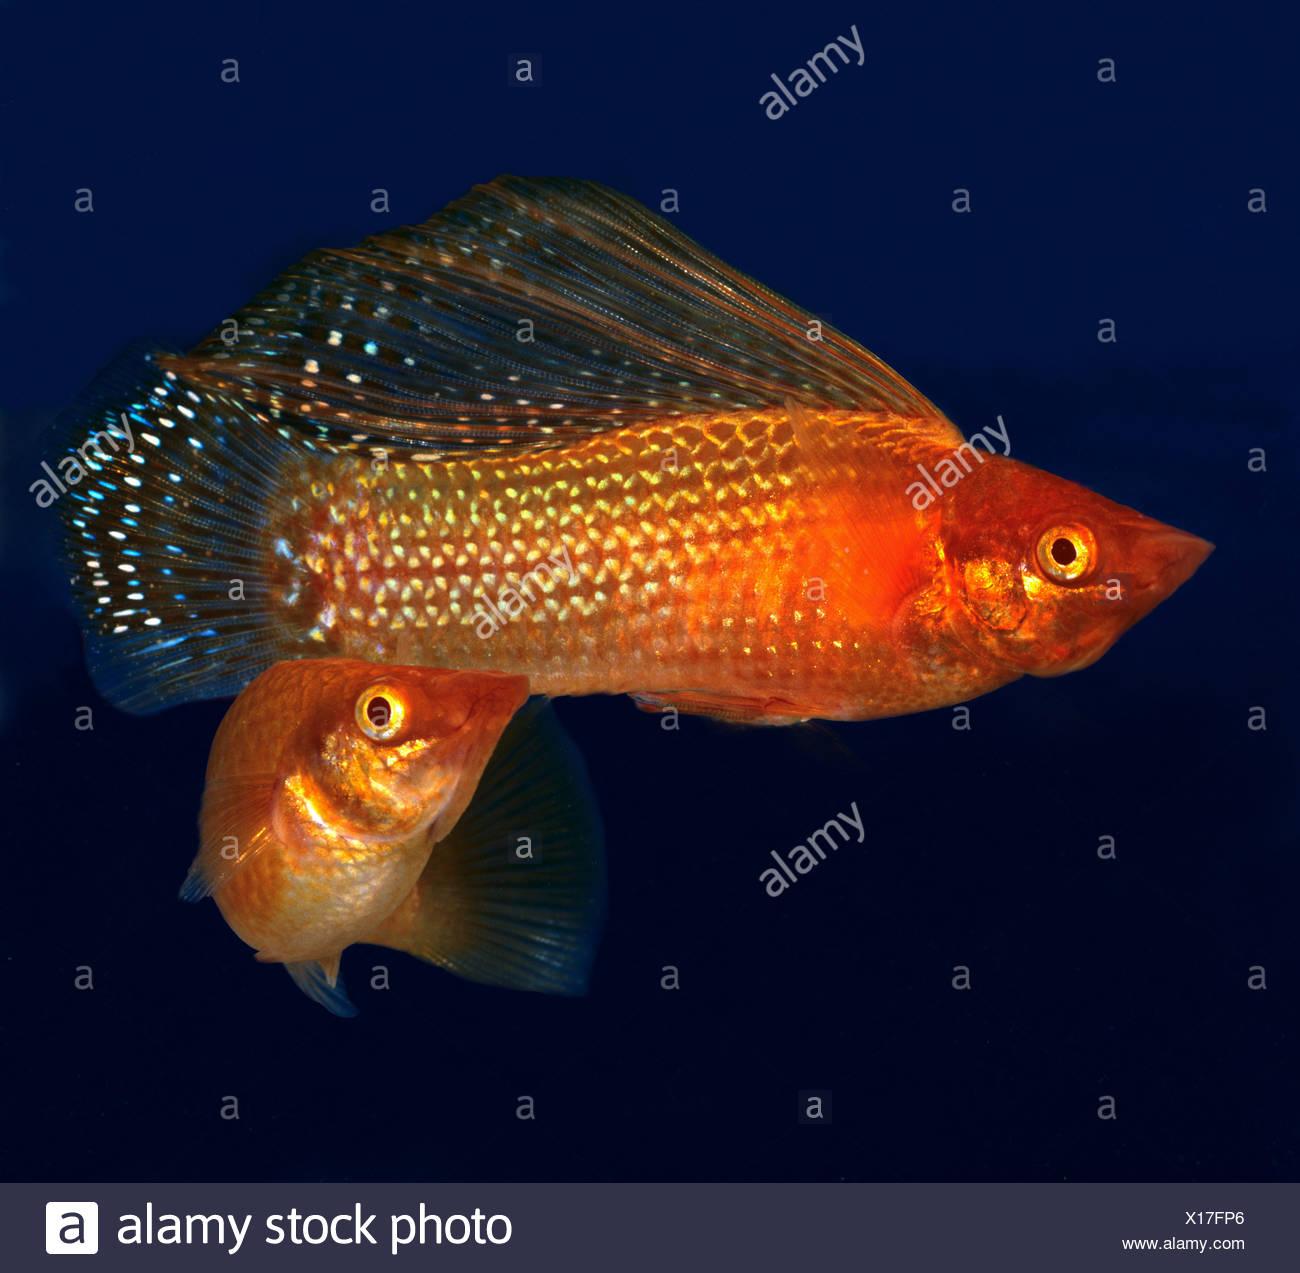 Yucatan Molly (Poecilia velifera). Two individuals in an aquarium Stock Photo